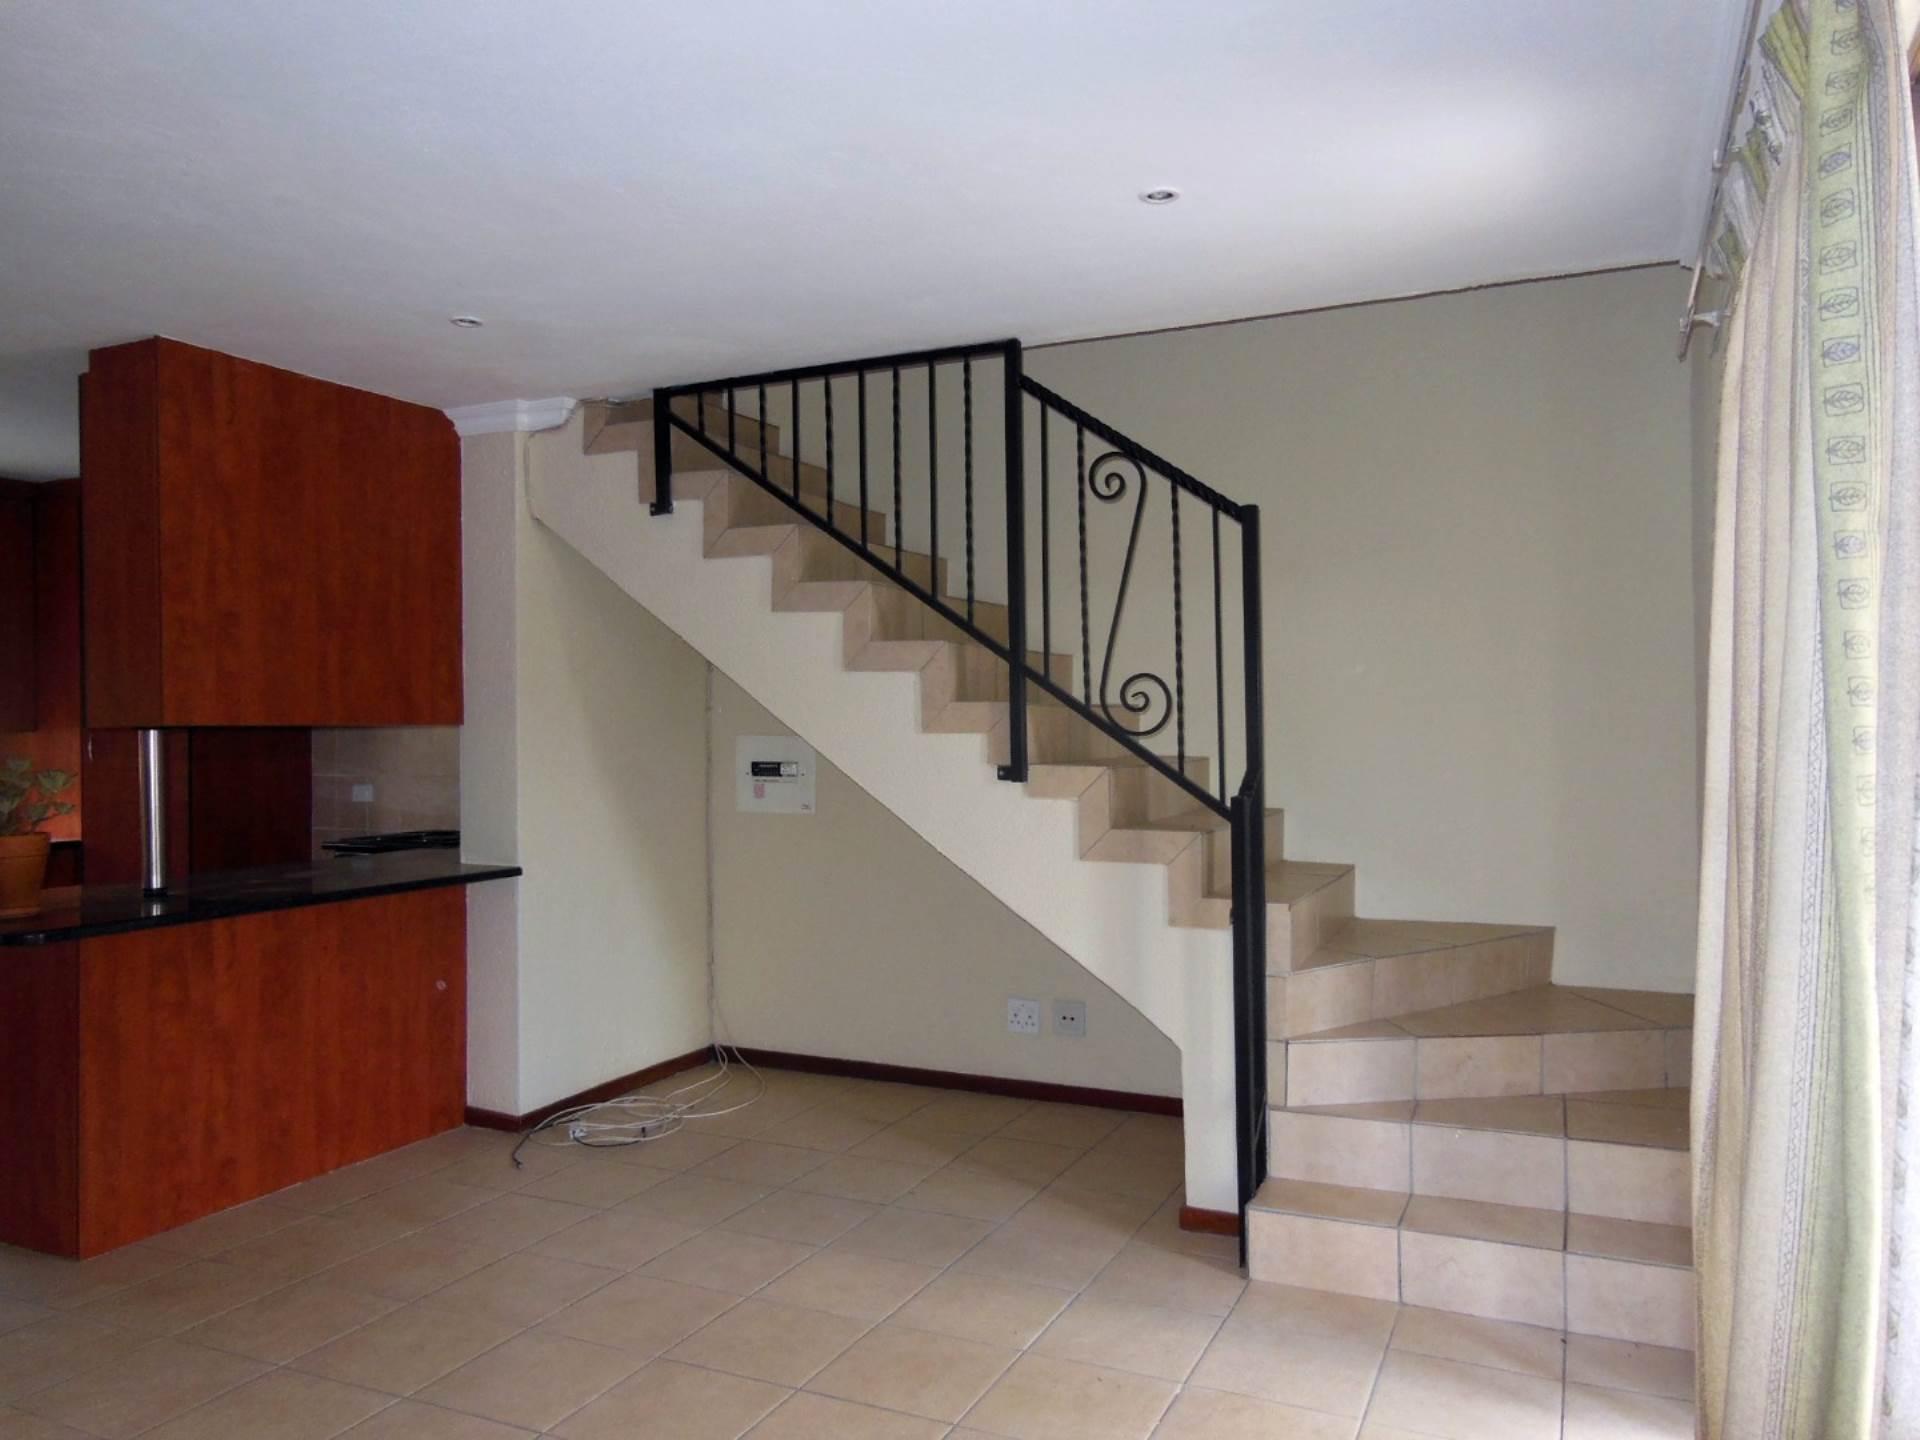 Pretoria, La Montagne Property  | Houses For Sale La Montagne, LA MONTAGNE, Townhouse 3 bedrooms property for sale Price:1,070,000